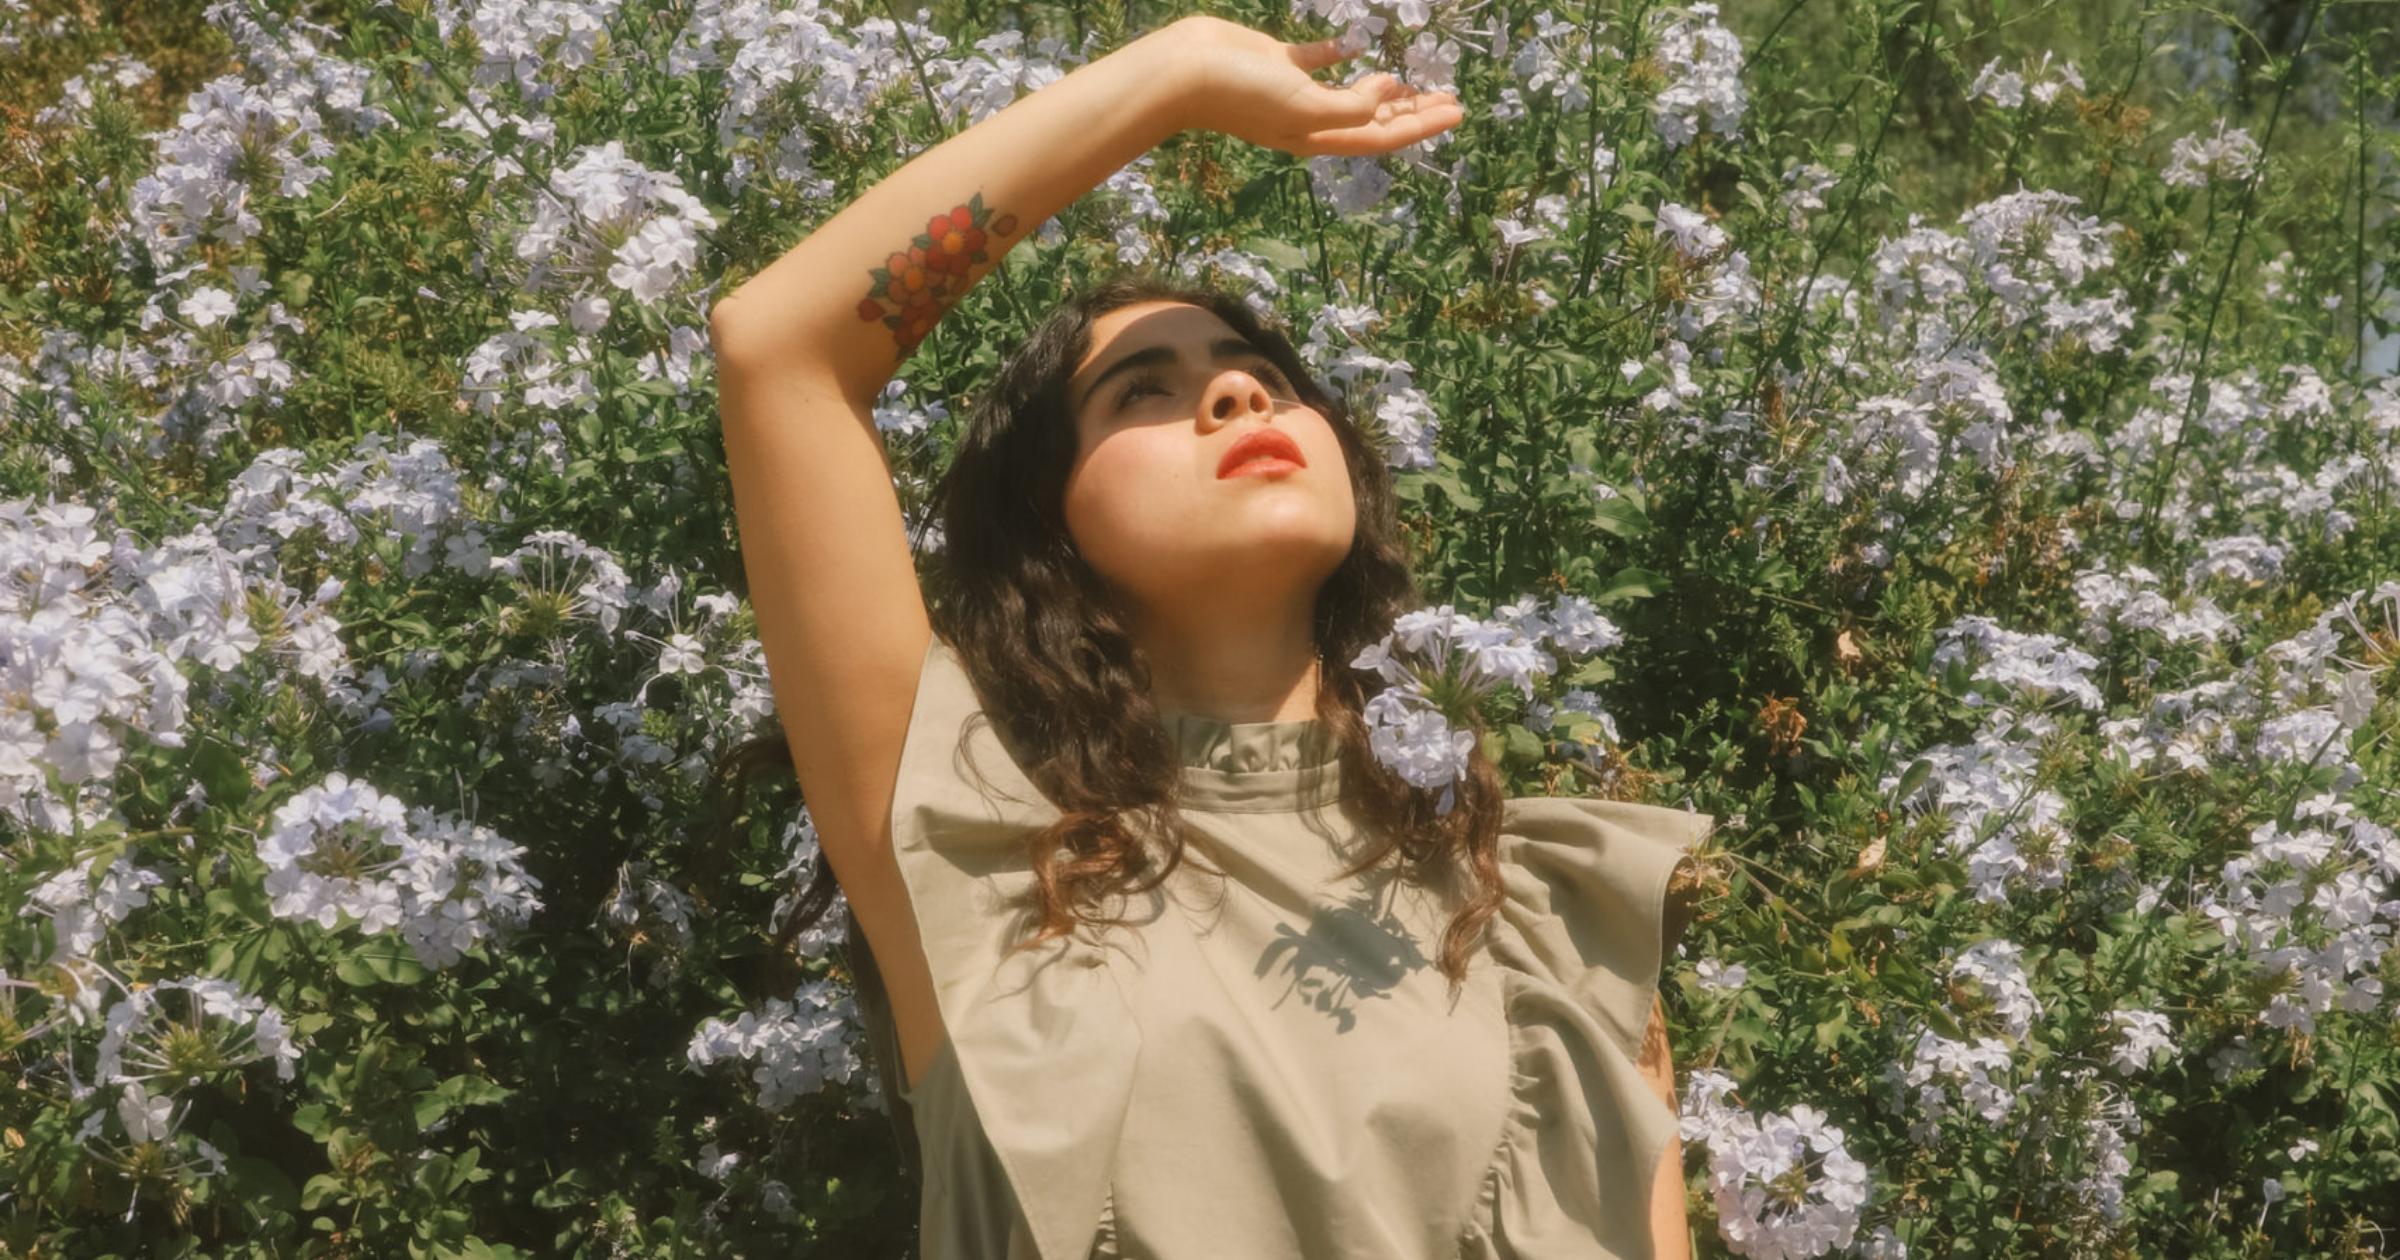 The Show on the Road – Silvana Estrada